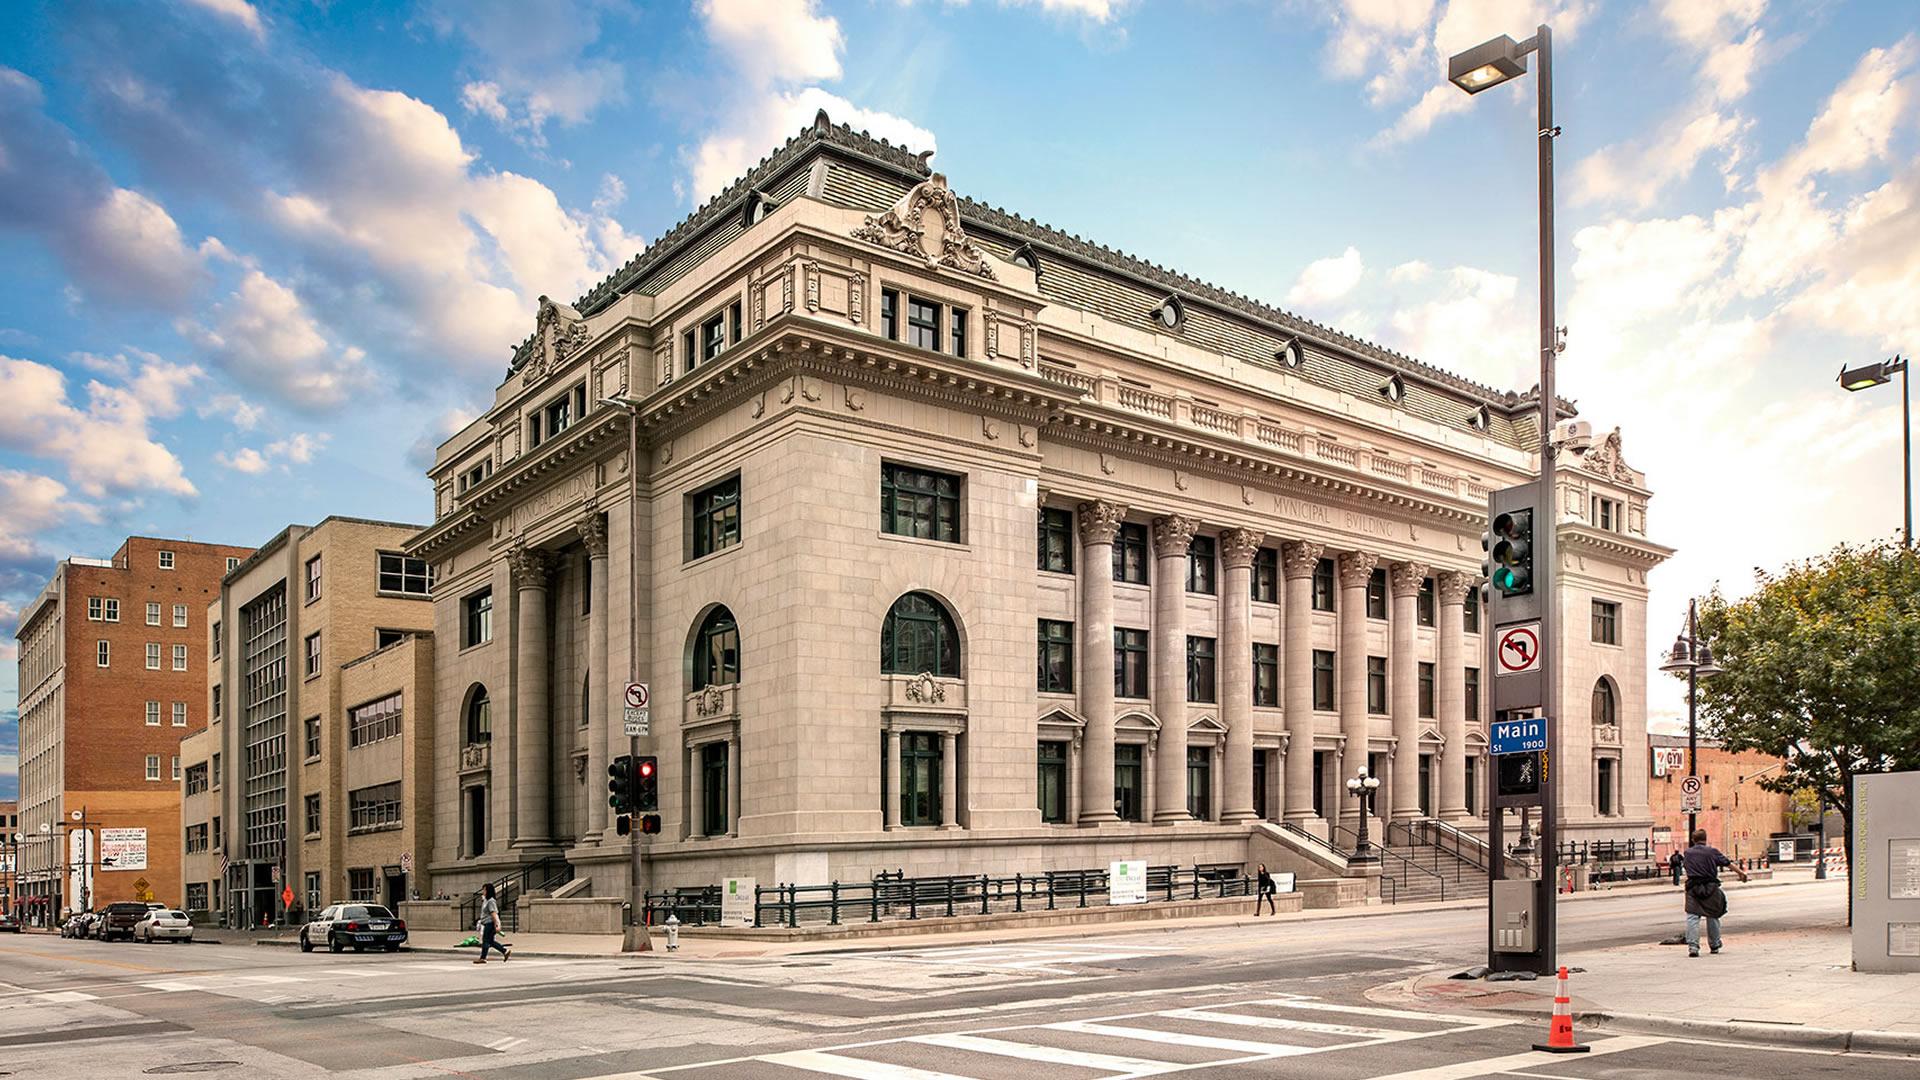 Dallas Municipal Building where Jack Ruby shot Lee Harvey Oswald.